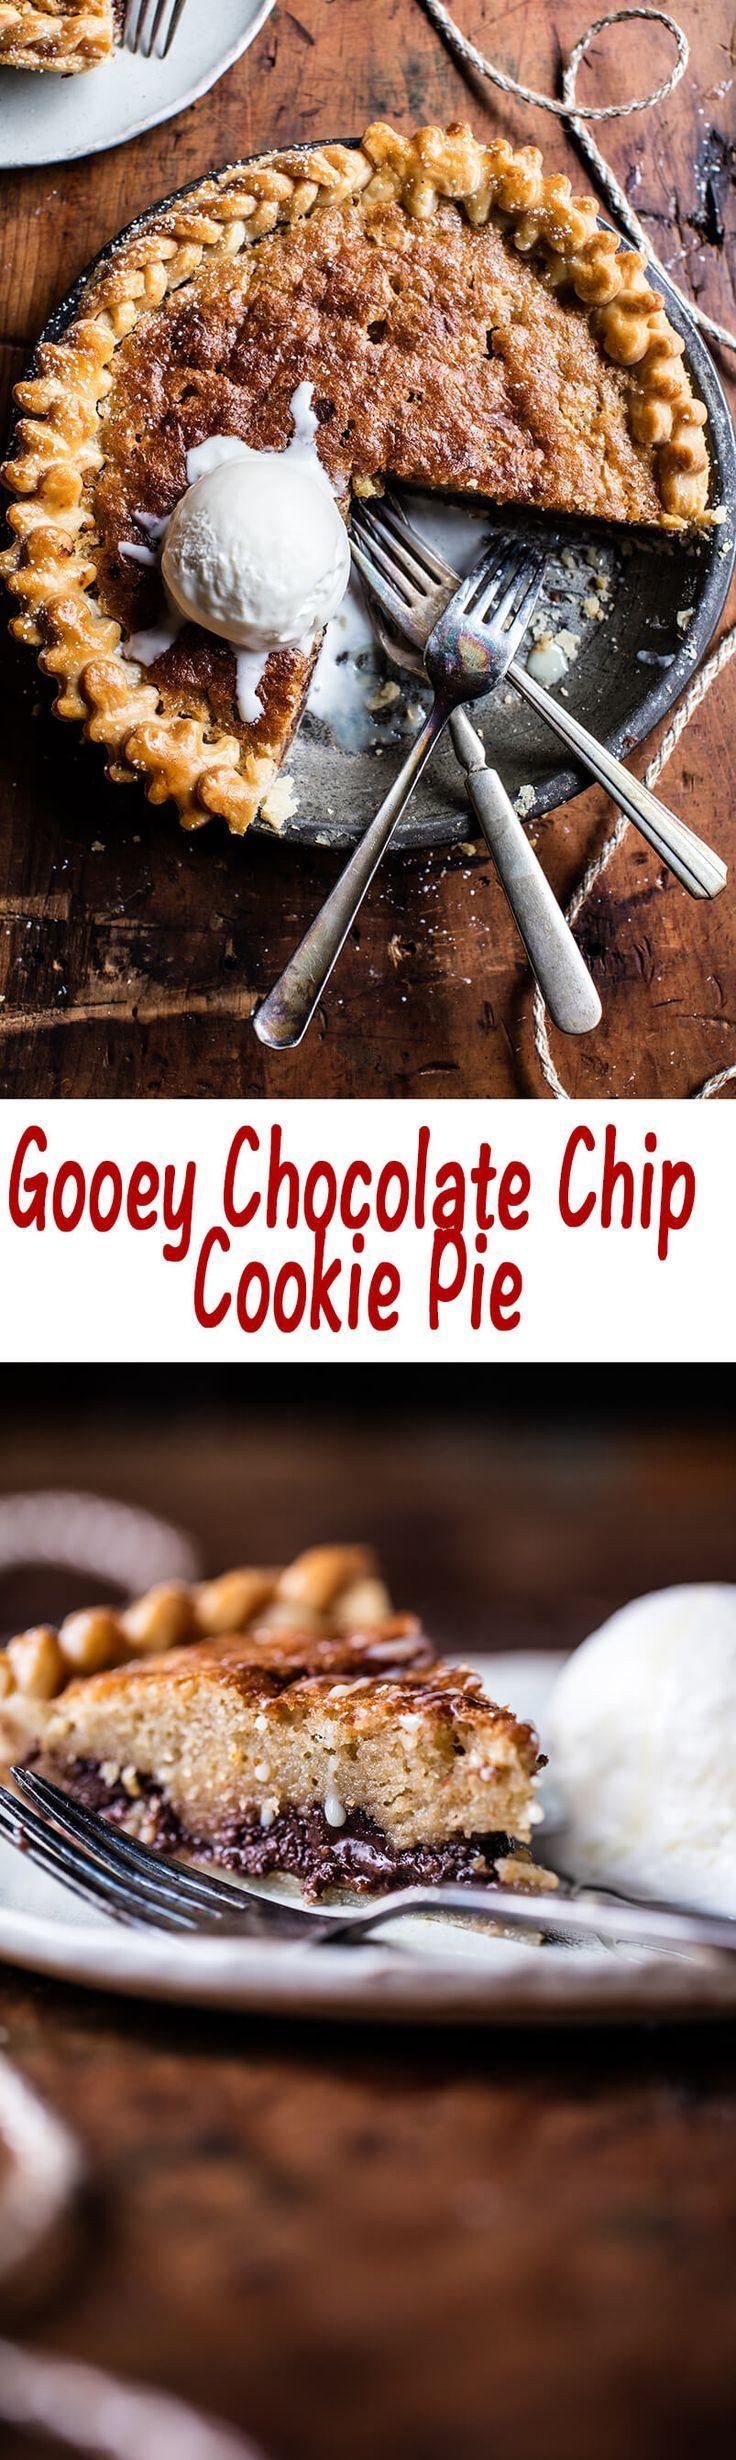 Gooey Chocolate Chip Cookie Pie | halfbakedharvest.com @Half Baked Harvest